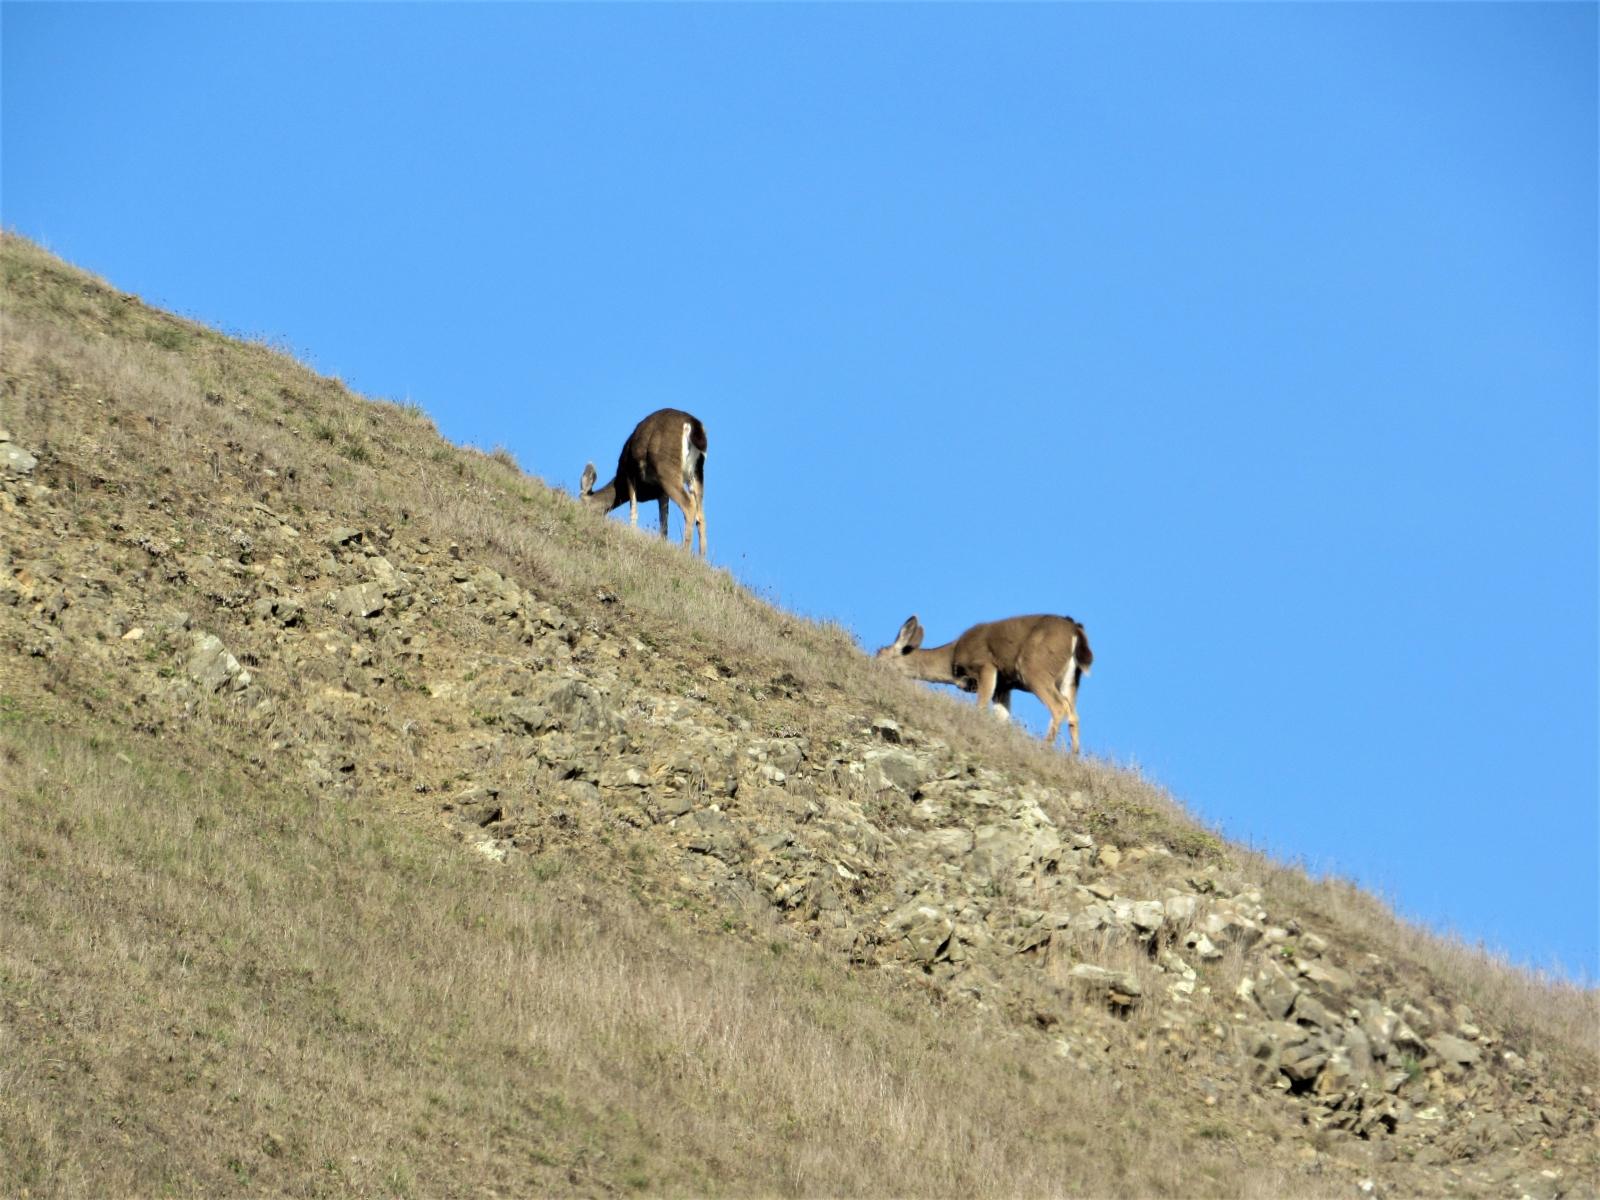 Goats-at-Goat-Rock